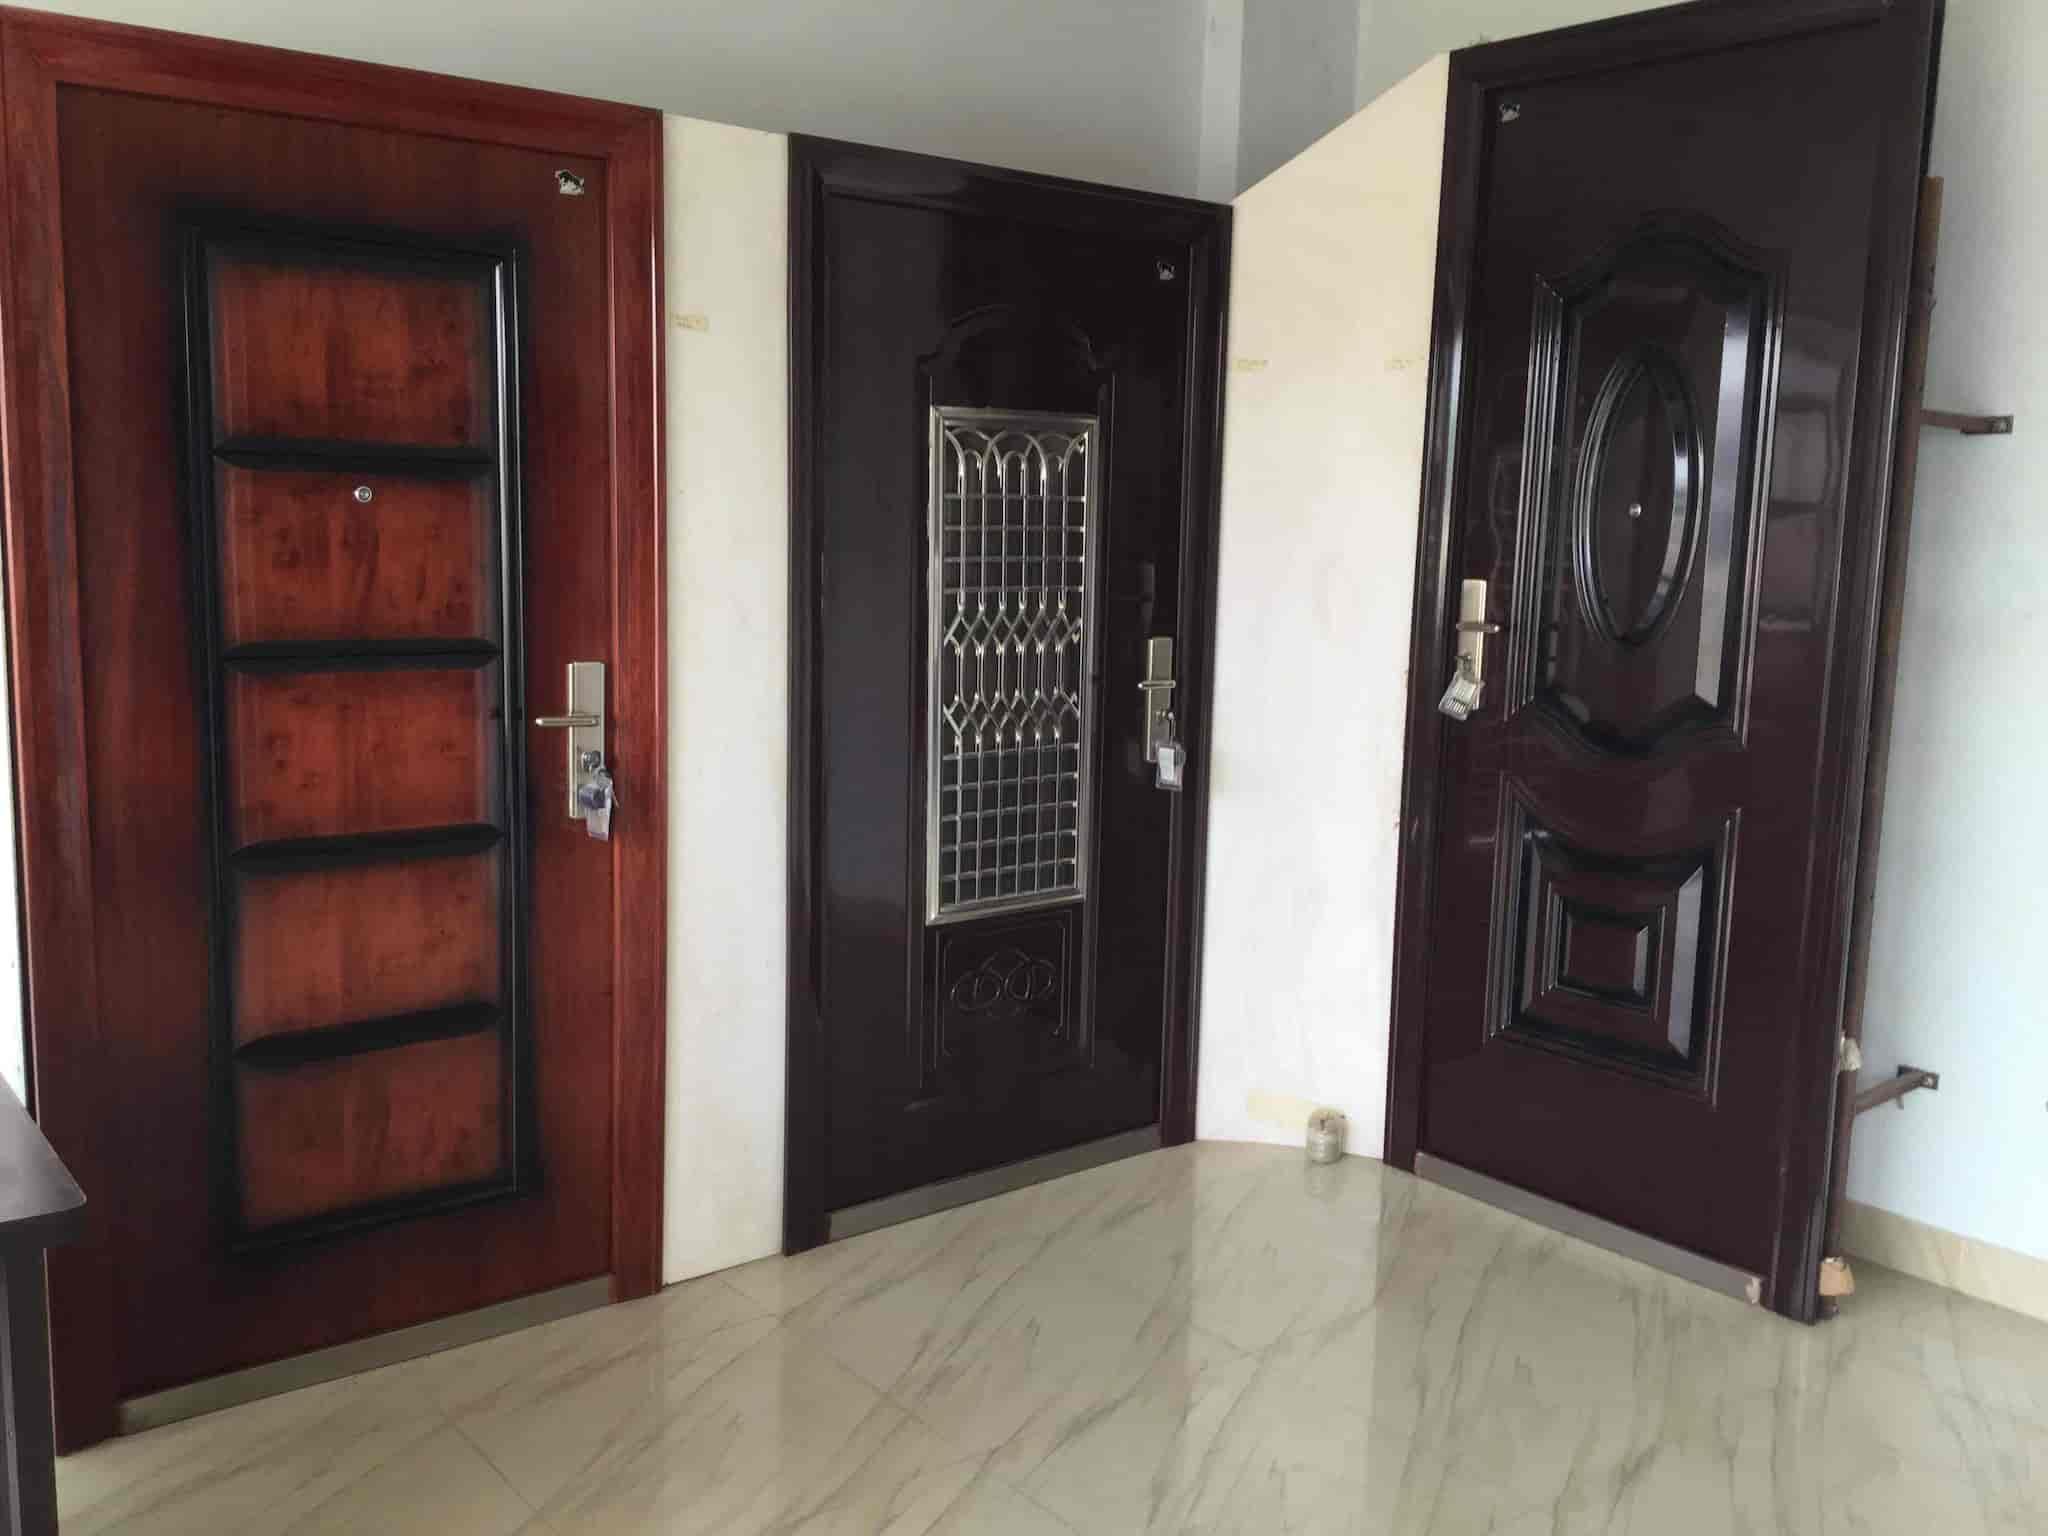 Modern Safety Door, Chinhat - Door Dealers in Lucknow - Justdial on